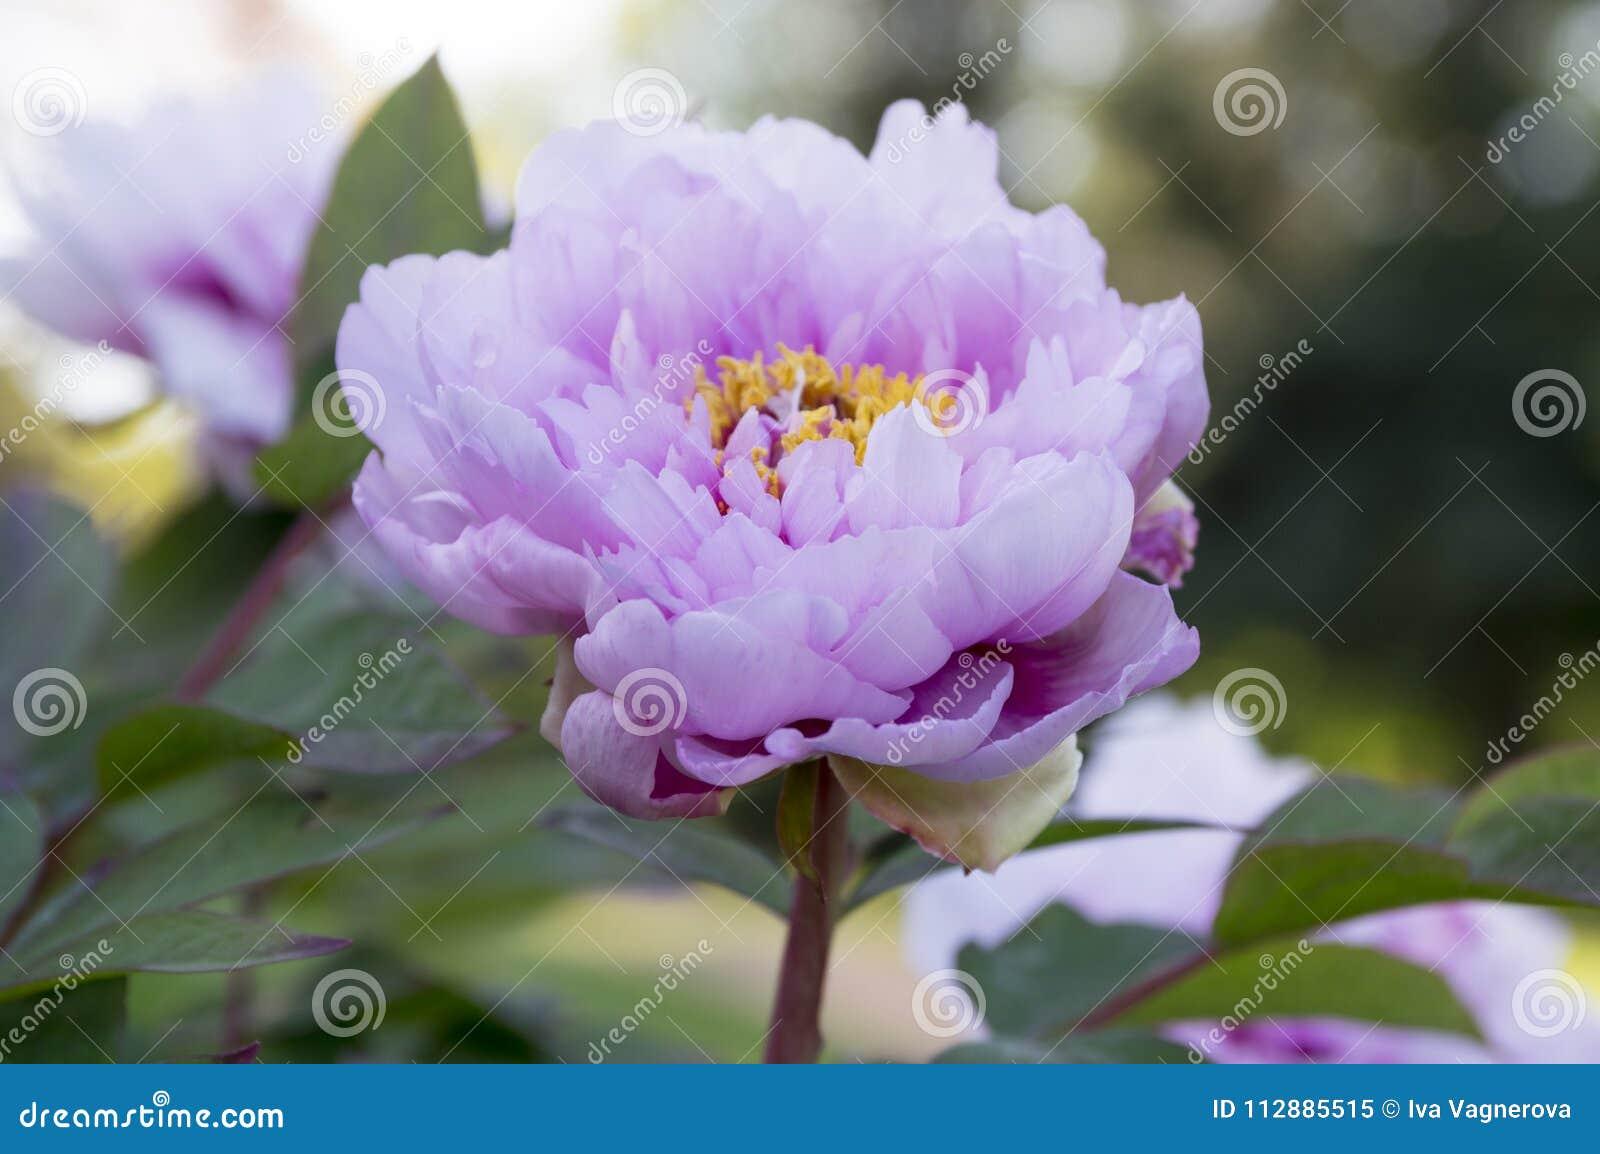 Paeonia Suffruticosa Tree Peonies In Bloom Stock Image Image Of